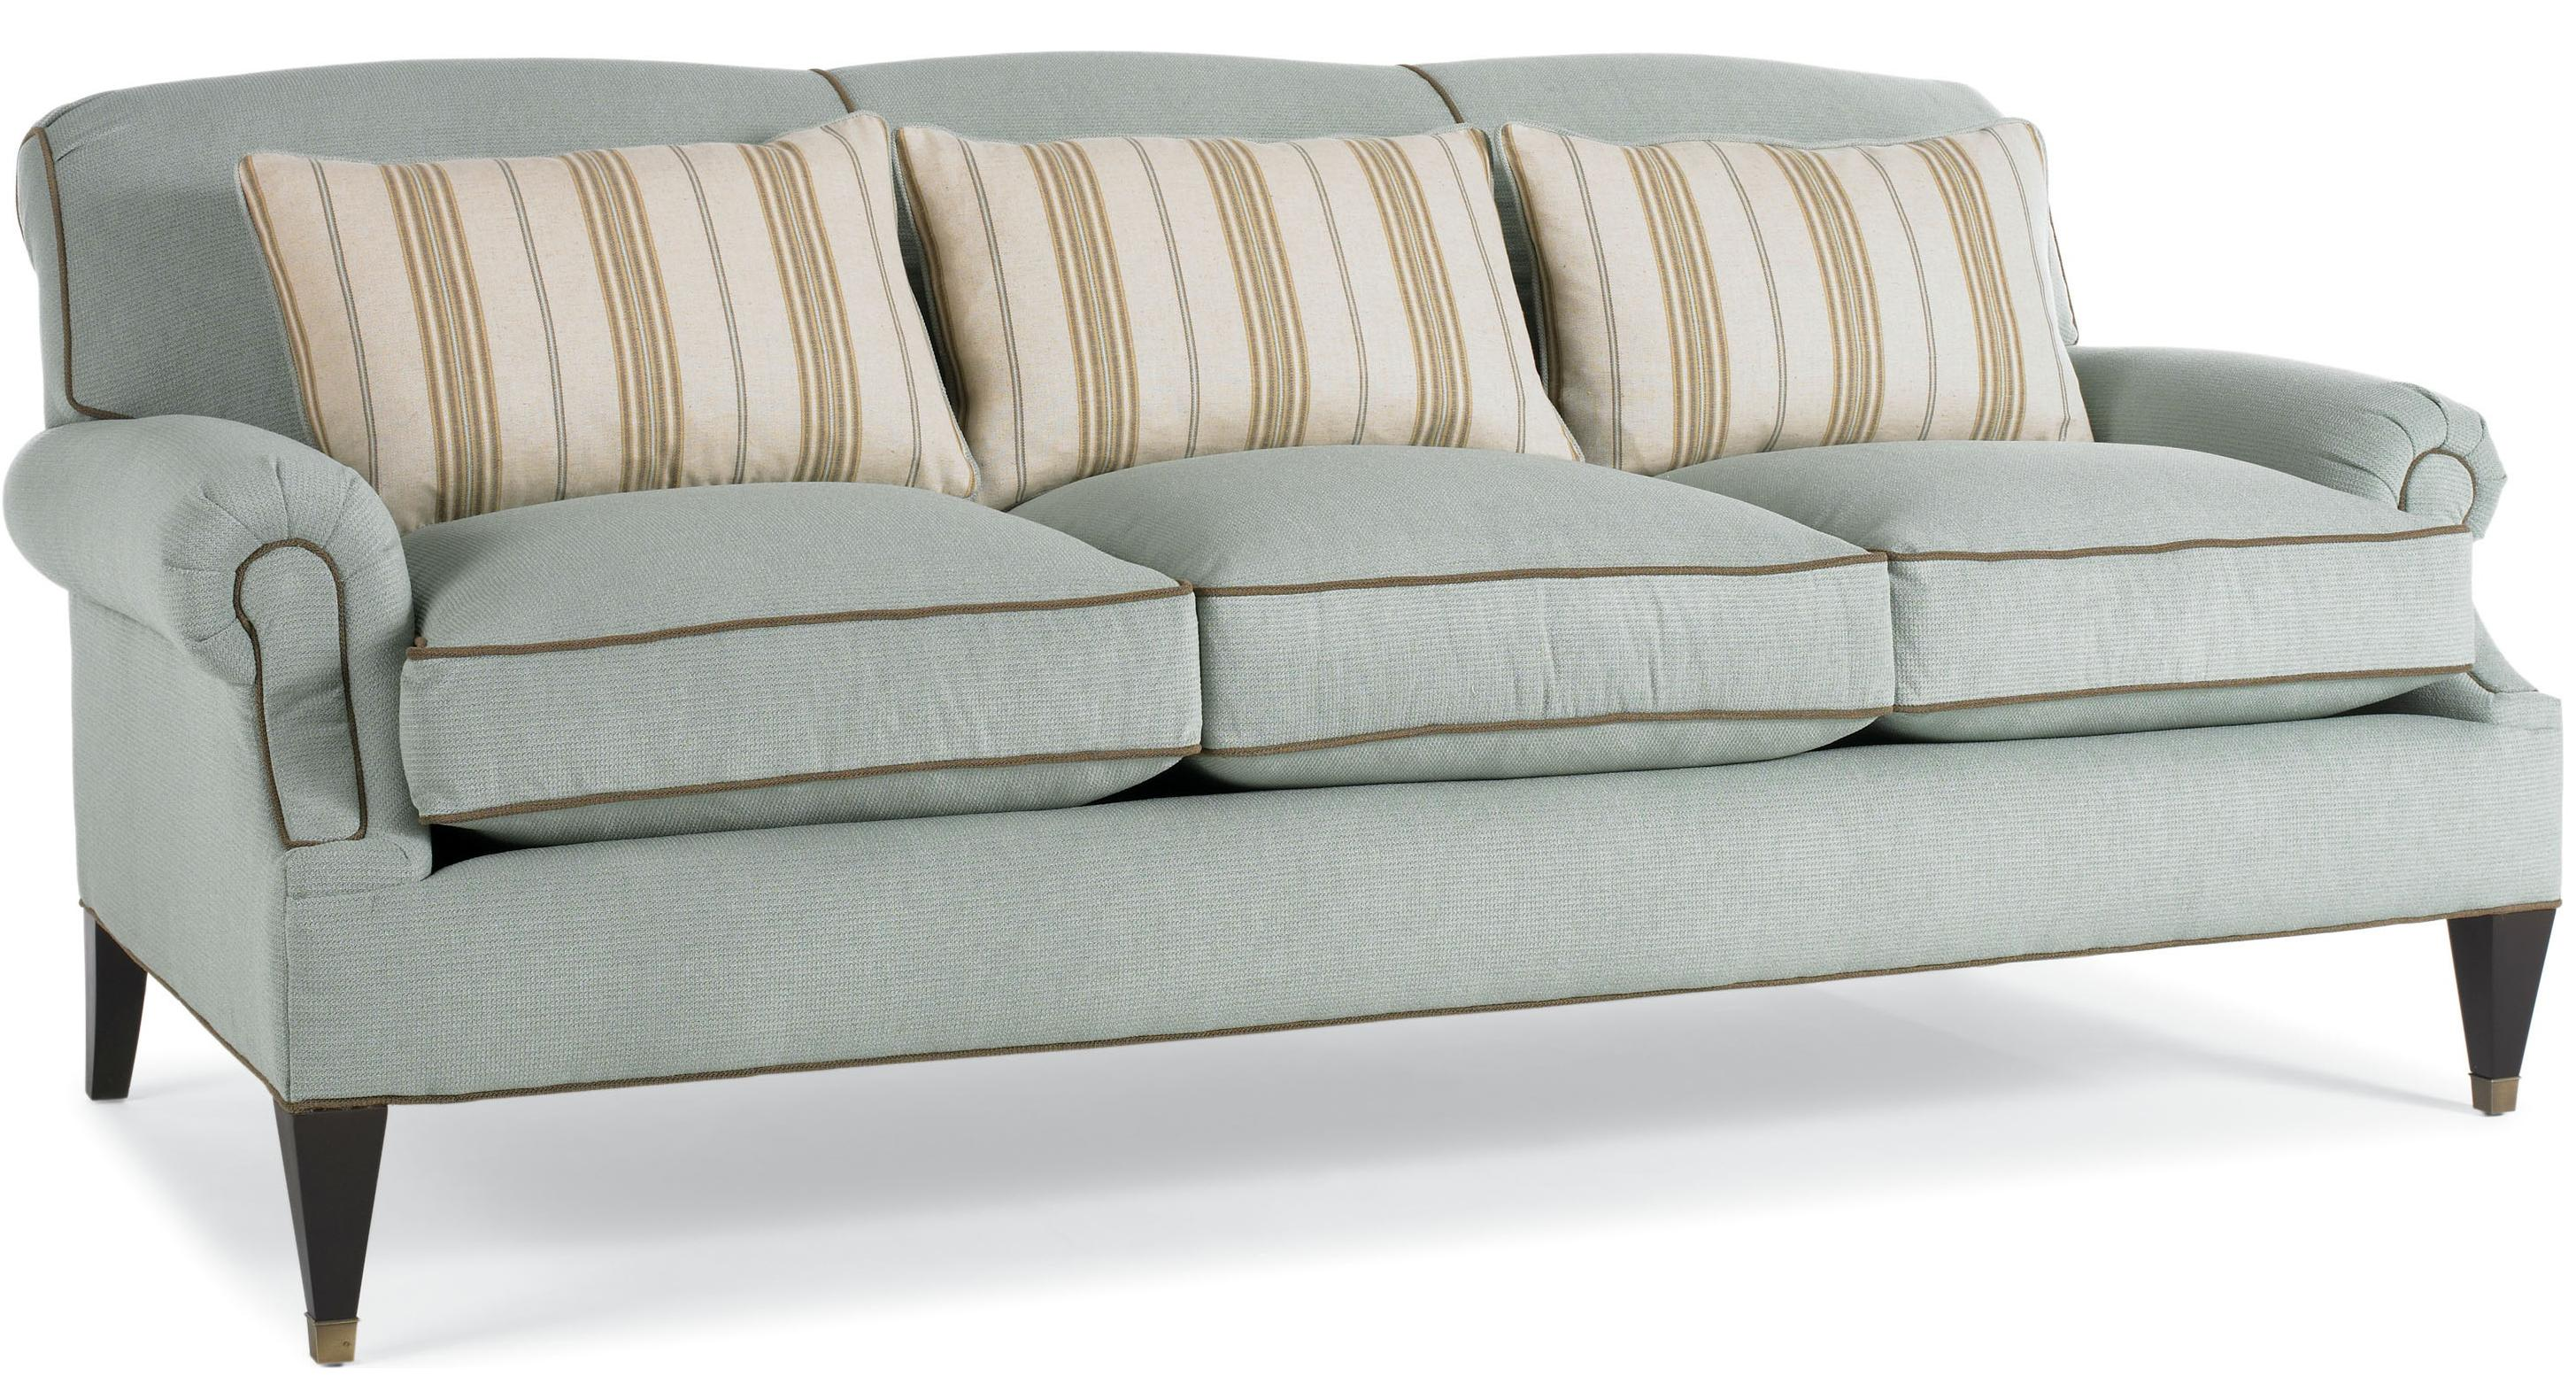 Drexel Heritage Living Room Chair